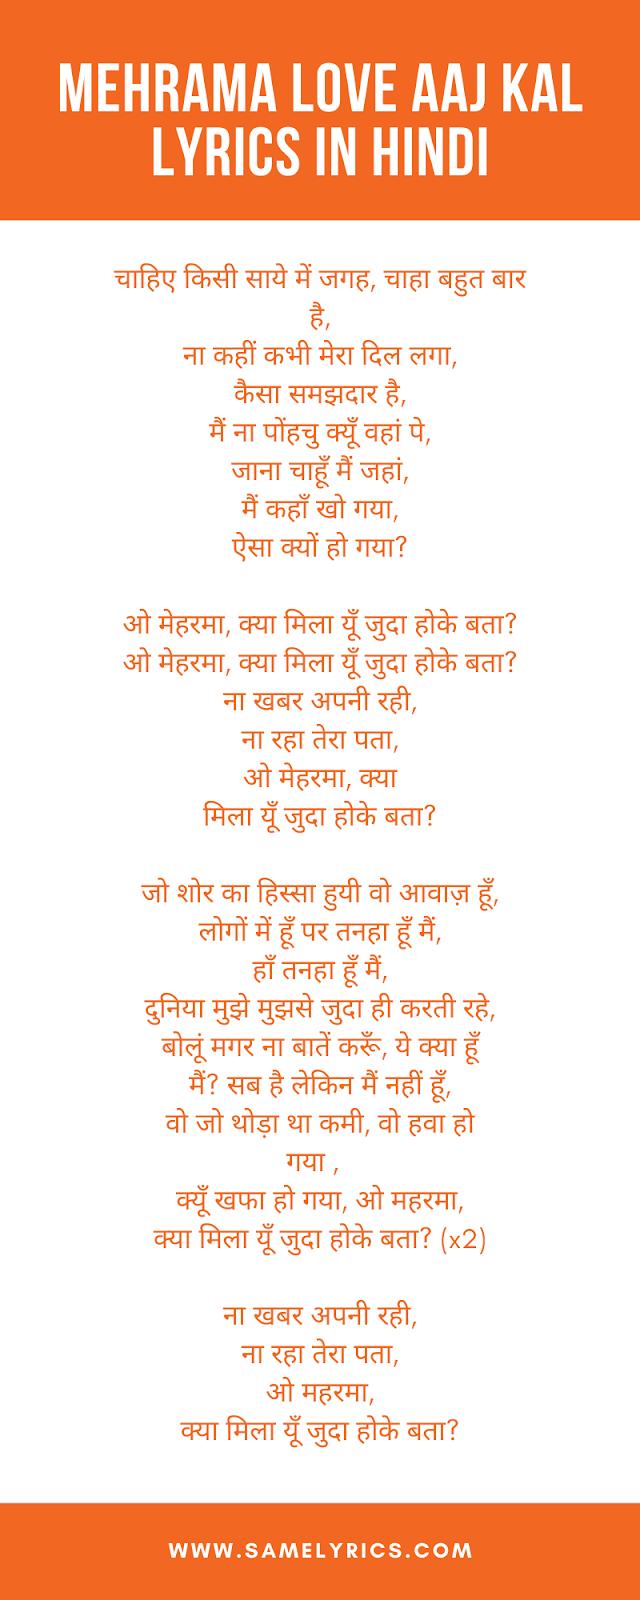 Mehrama Love Aaj Kal Lyrics In Hindi